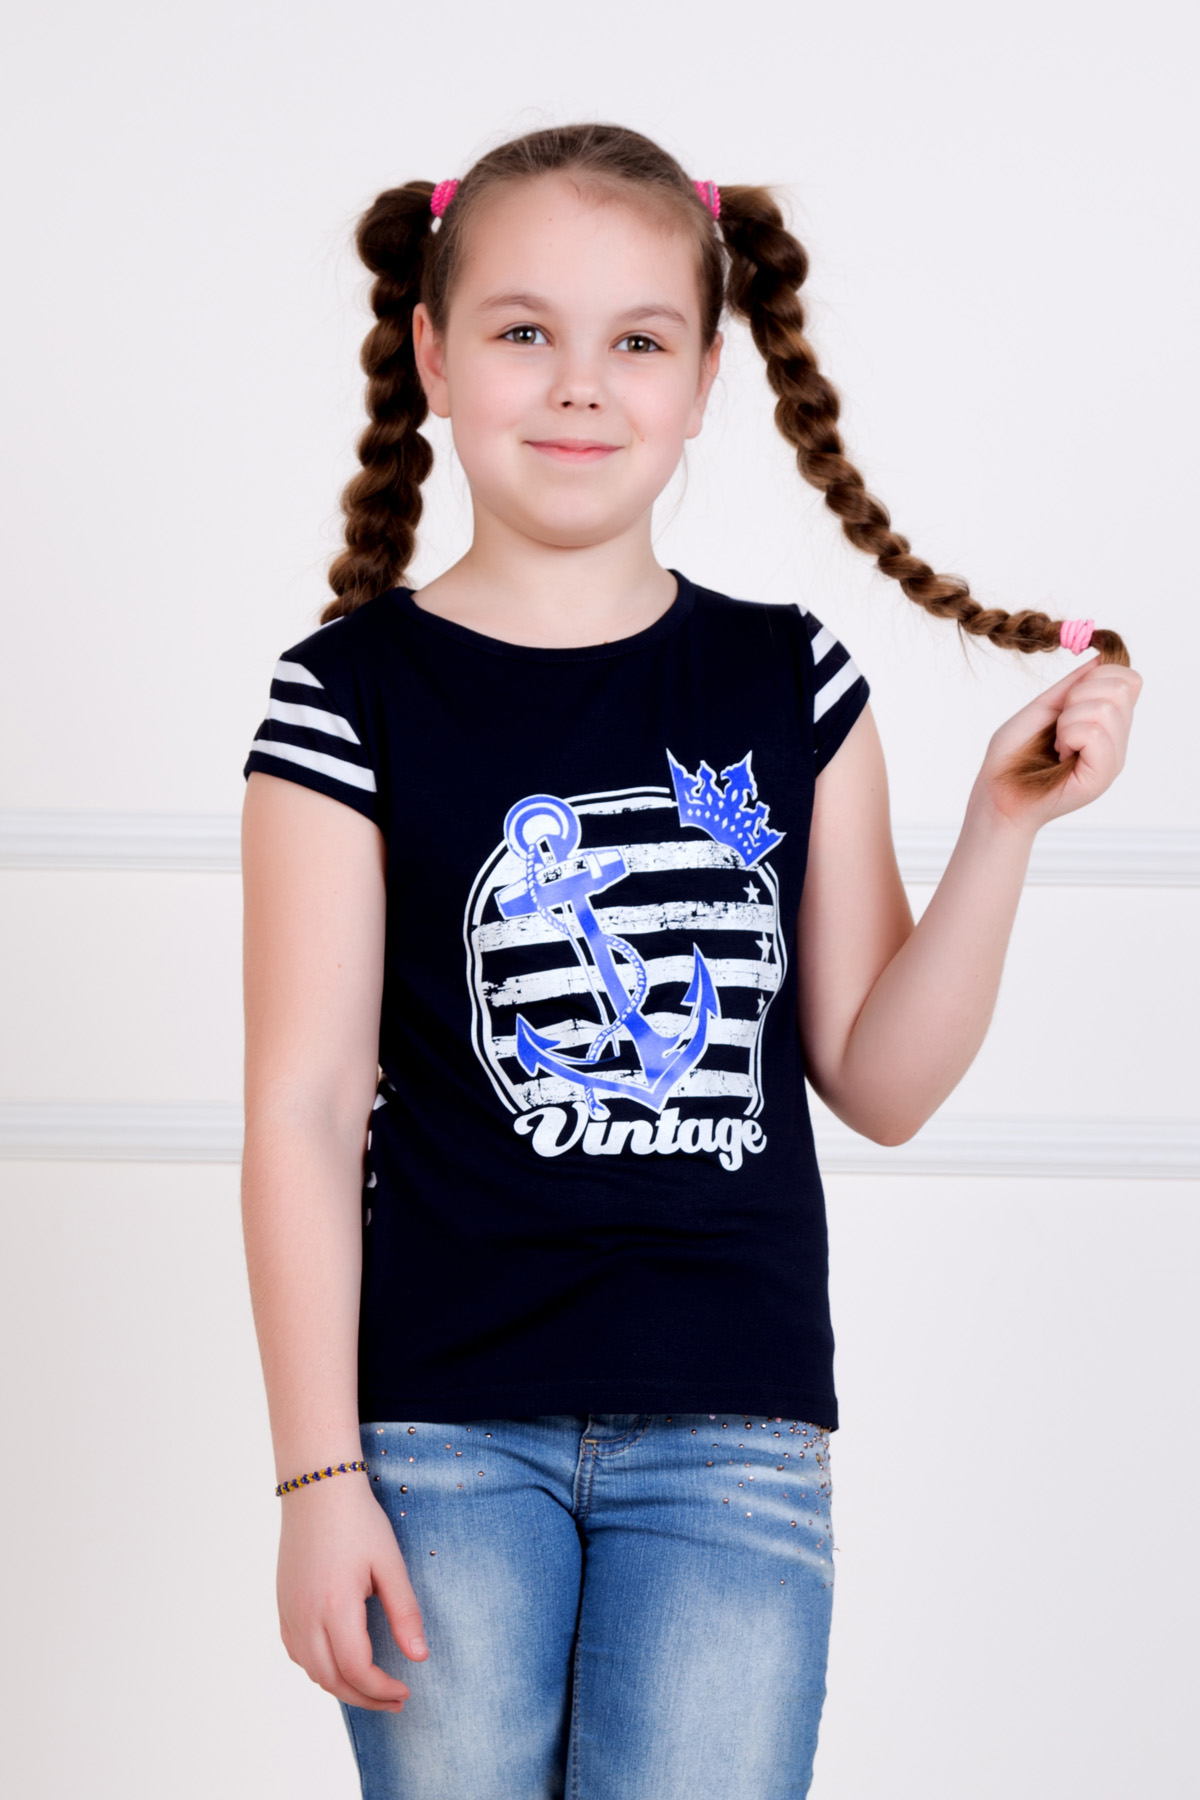 Дет. футболка Якорек р. 30Распродажа товаров<br><br><br>Тип: Дет. футболка<br>Размер: 30<br>Материал: Вискоза